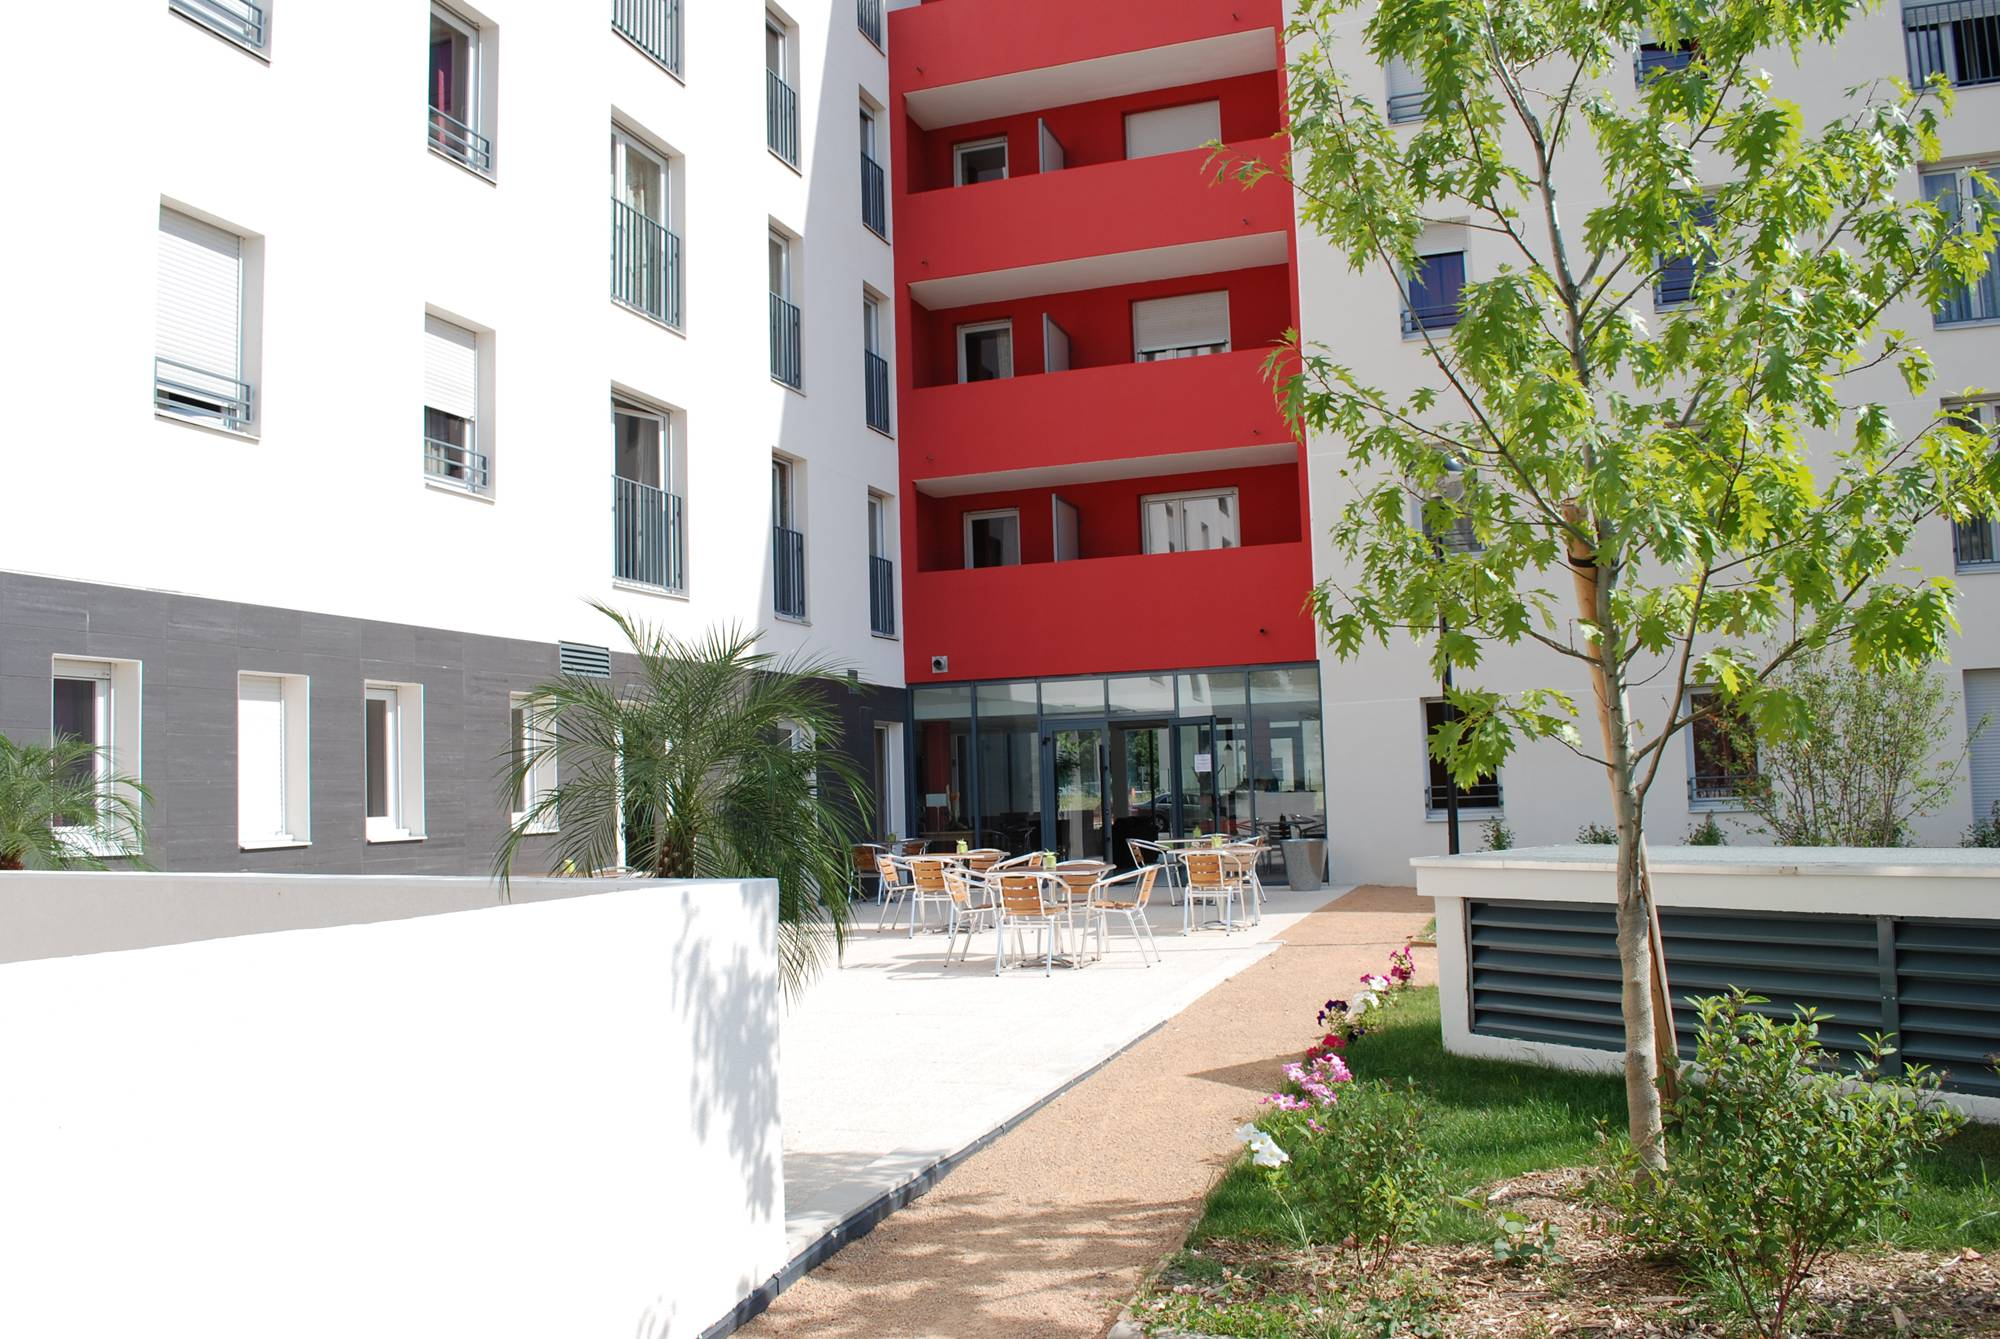 Hotel appart hotel odalys bioparc lyon viajes olympia for Appart hotel odalys lyon